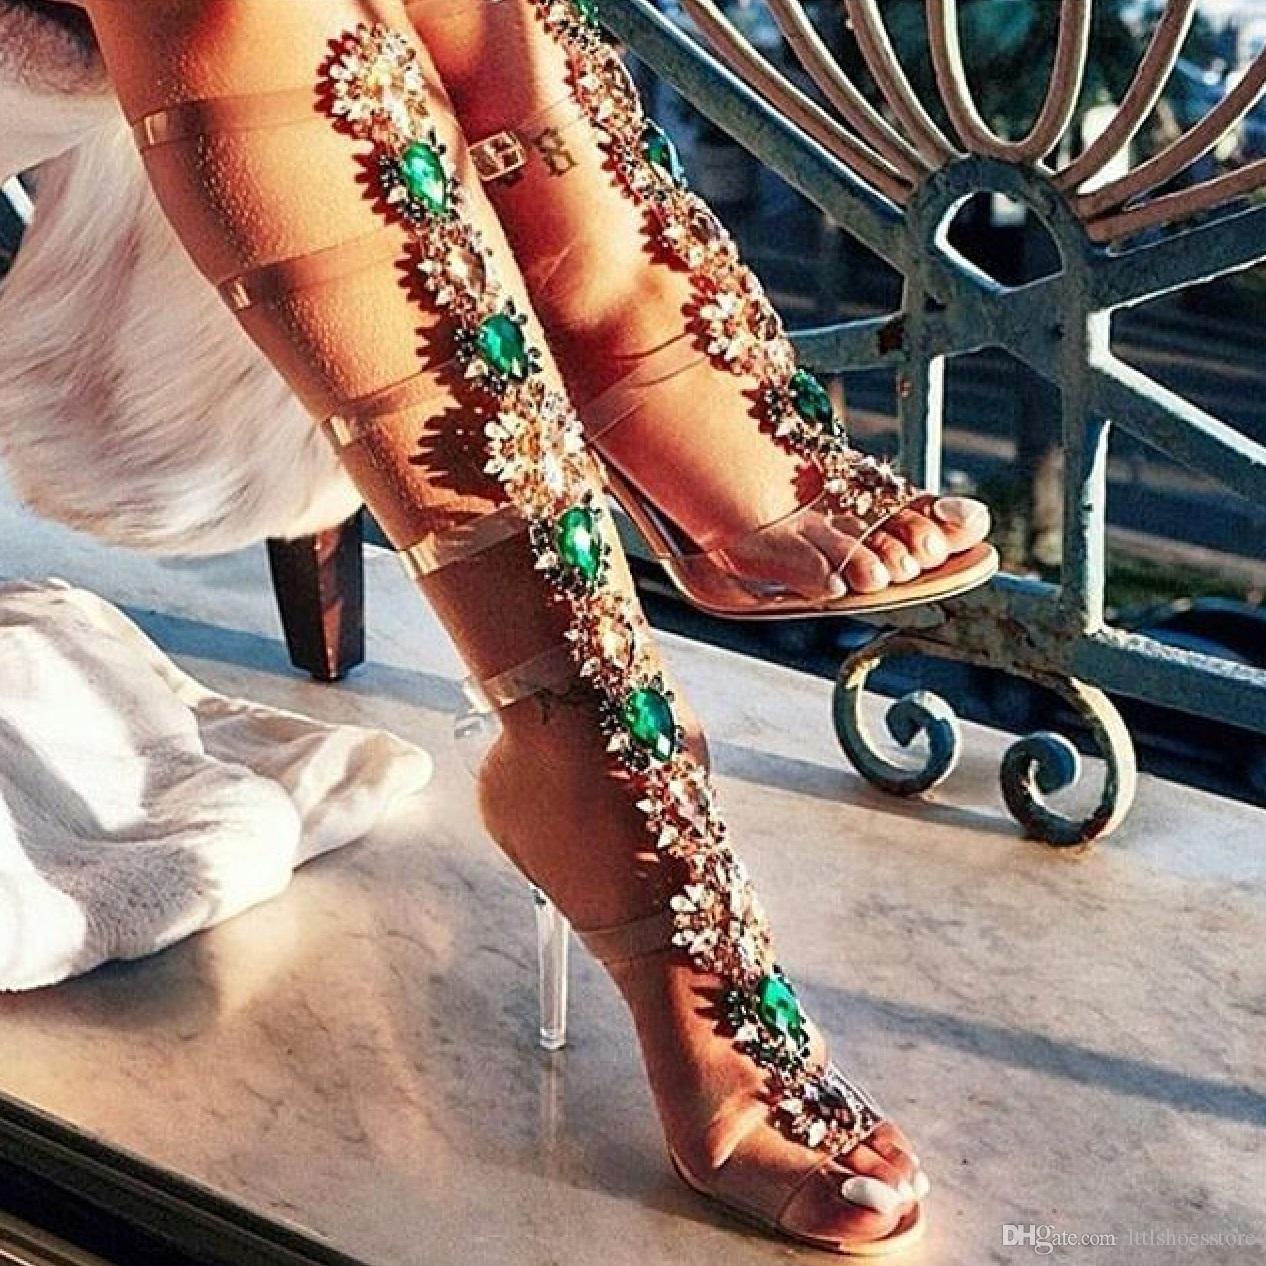 Runway Lttl Hauts Sangle Talons Celebrity Shinning Style Marque Chaussons Chaussures Pvc Sandales Cristal Rihanna Boucle Clair f7yY6bg